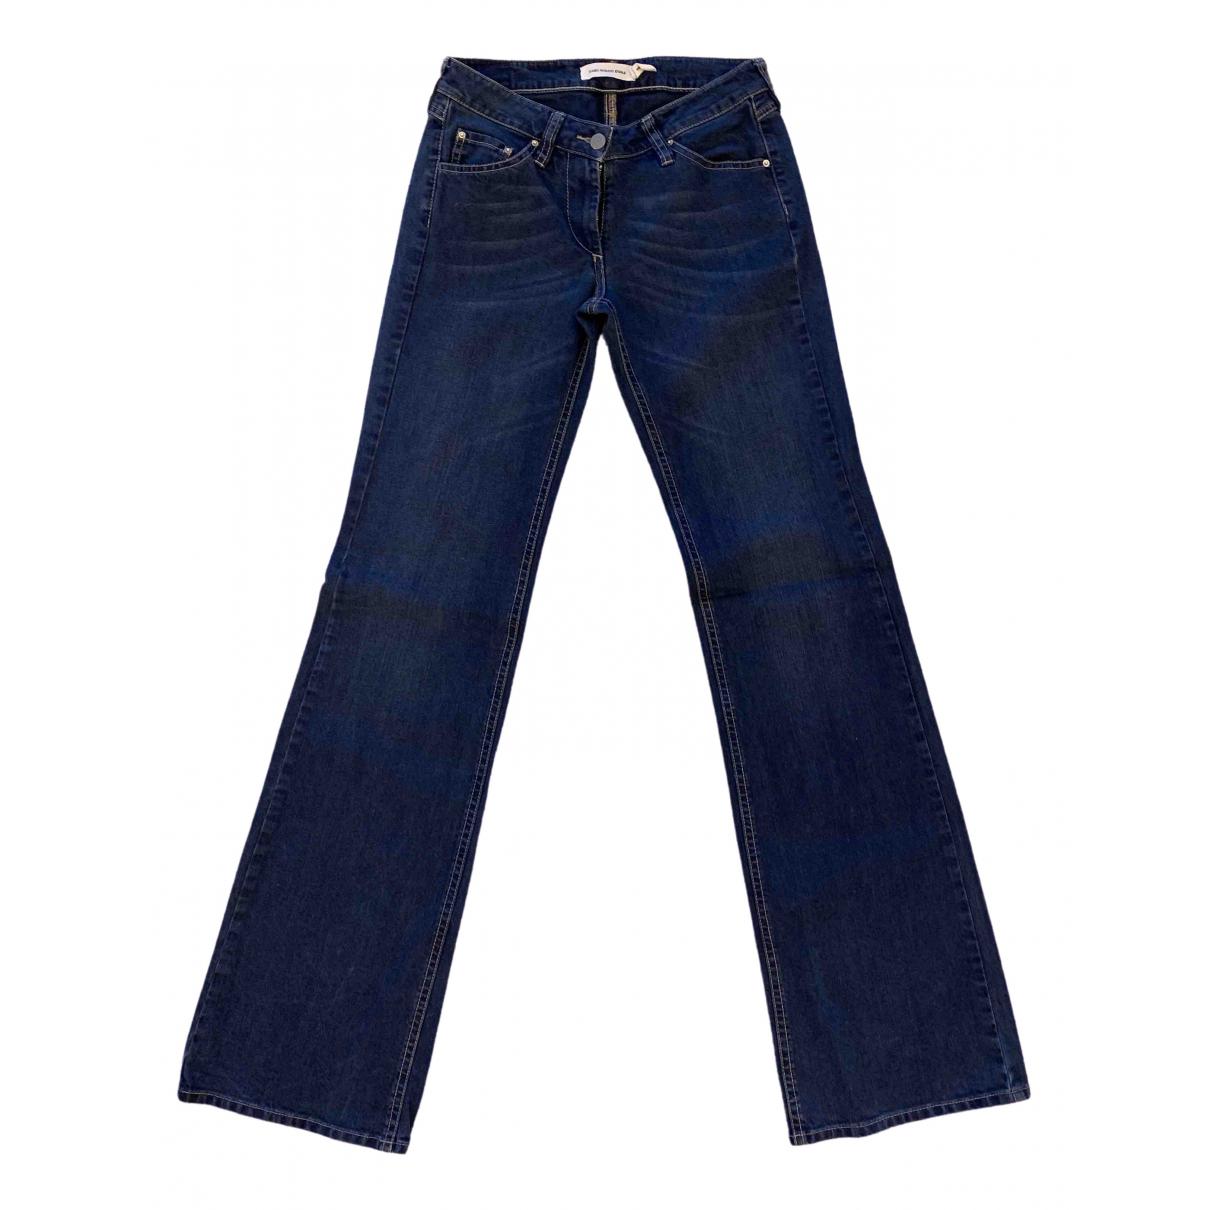 Isabel Marant Etoile \N Blue Cotton - elasthane Jeans for Women 36 FR